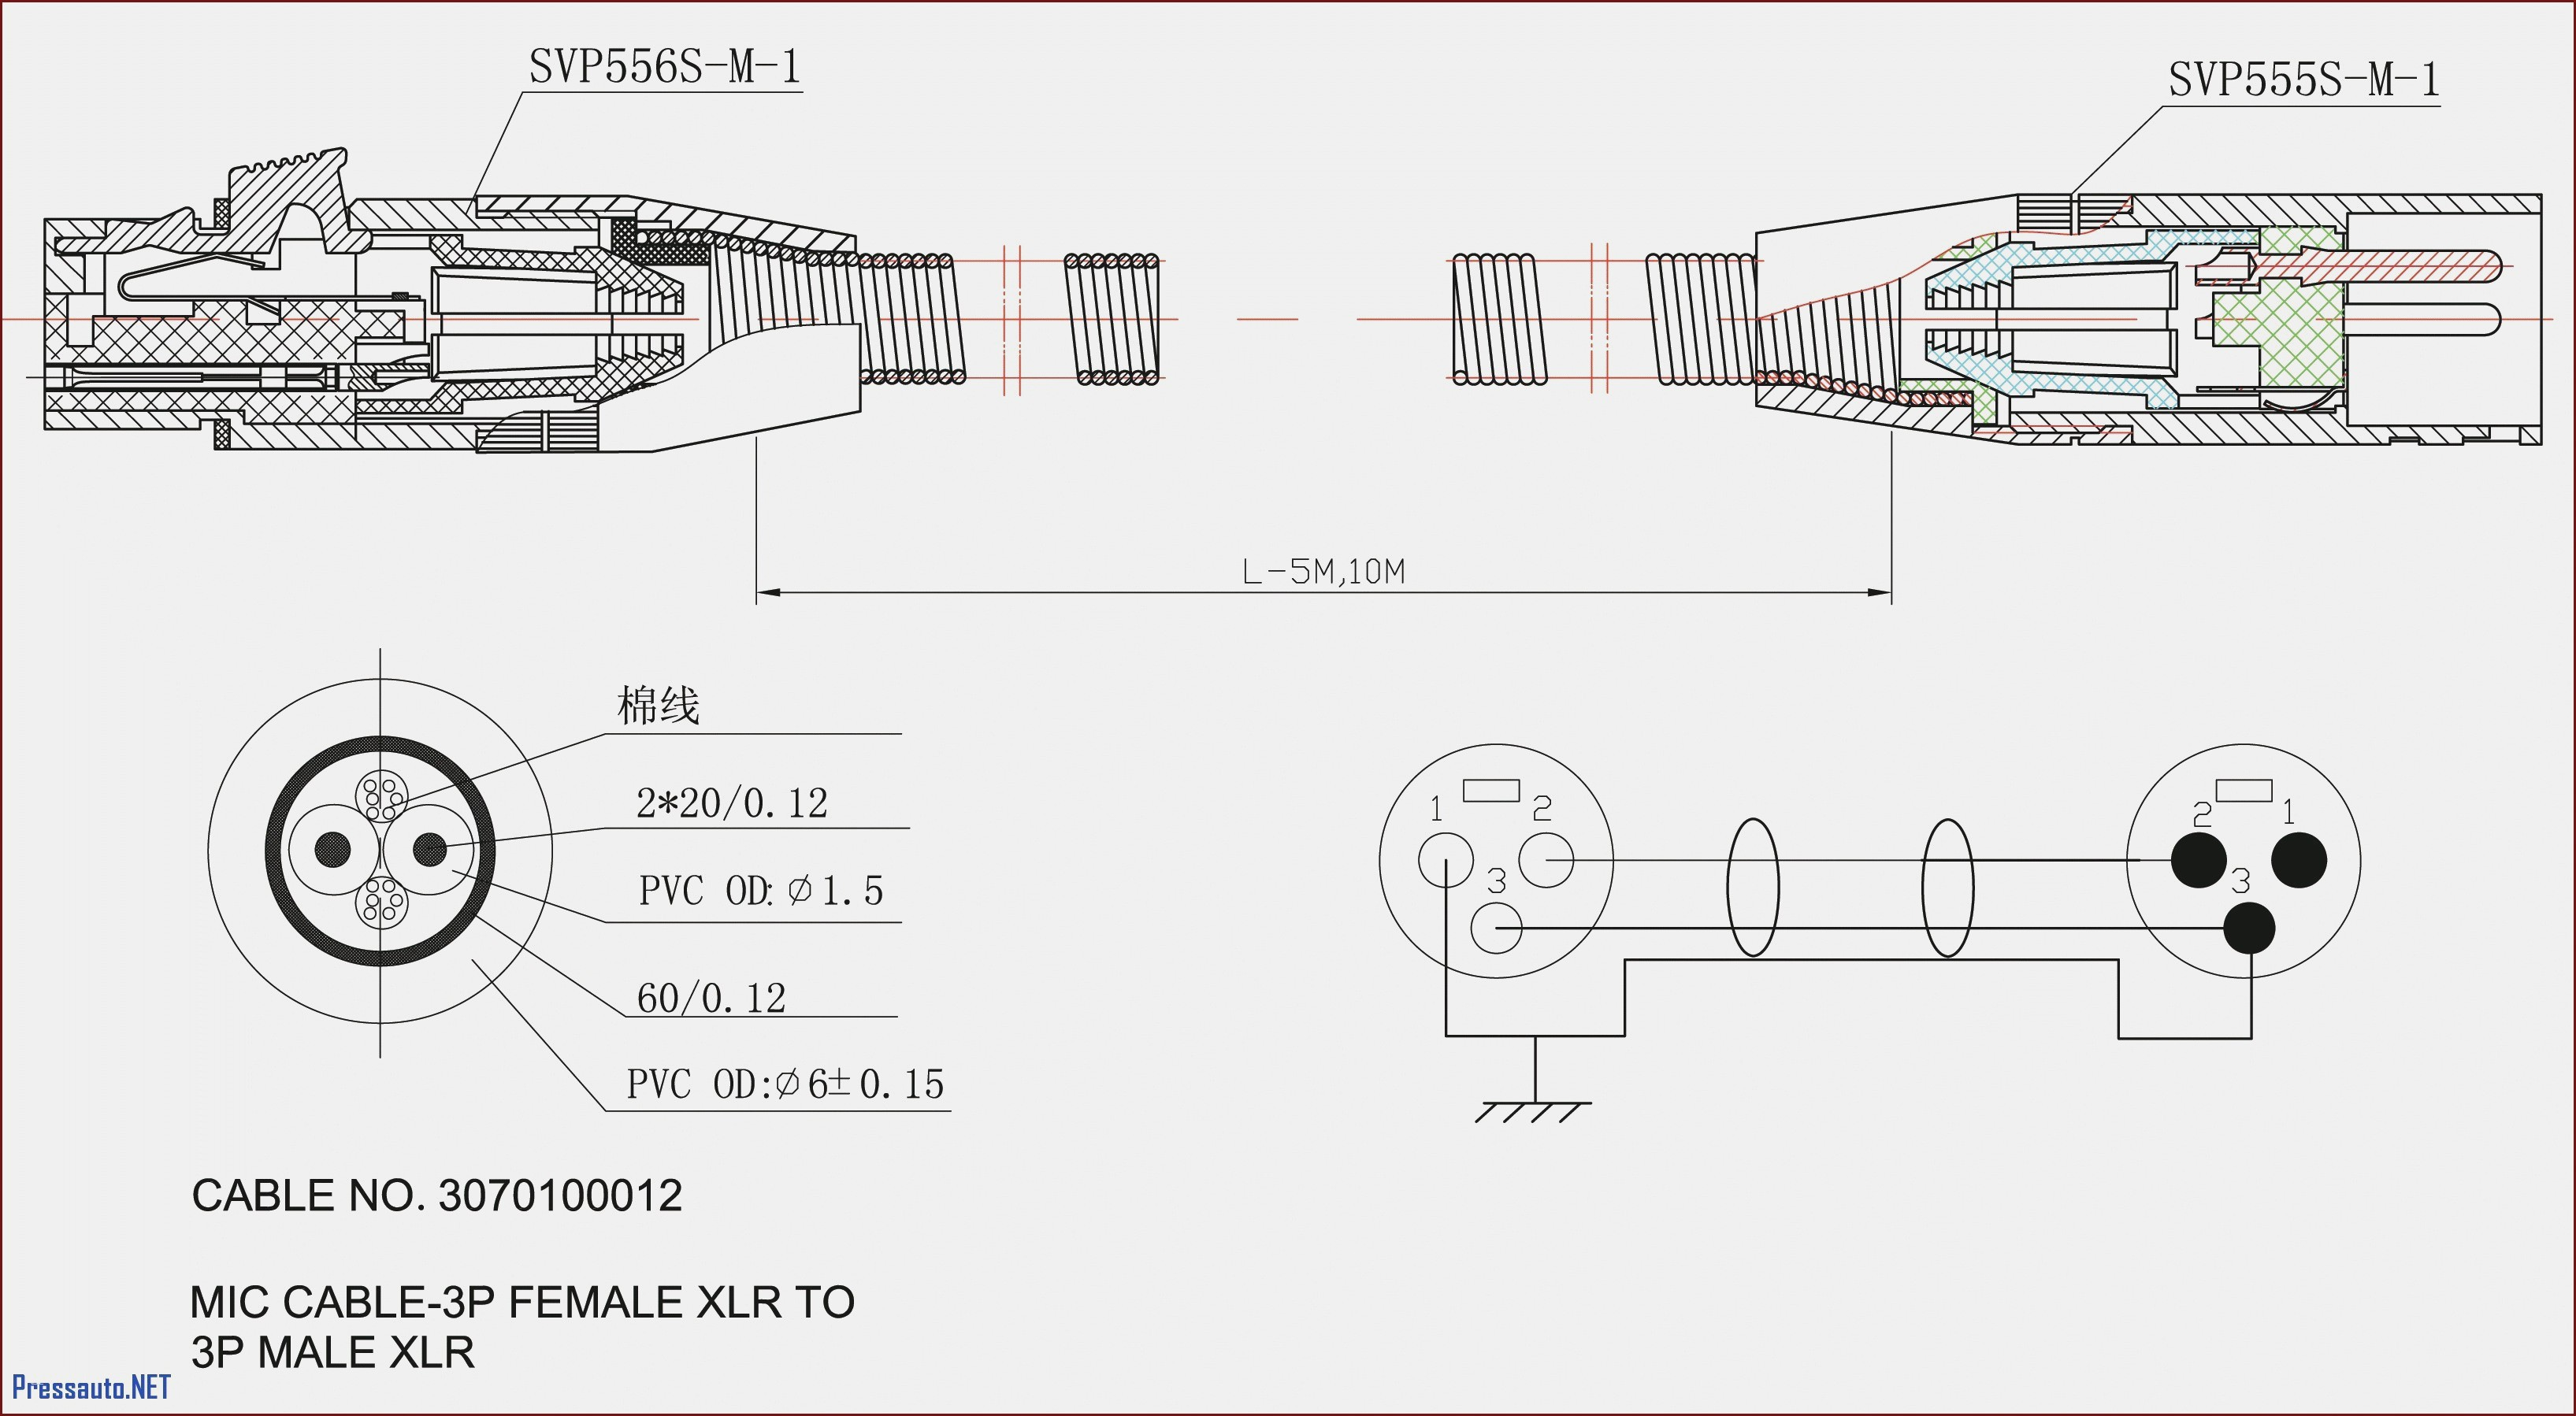 Fuel Pump Wiring Diagram Eca5 Wiring Diagram for Harley Davidson Garage Door Opener Of Fuel Pump Wiring Diagram